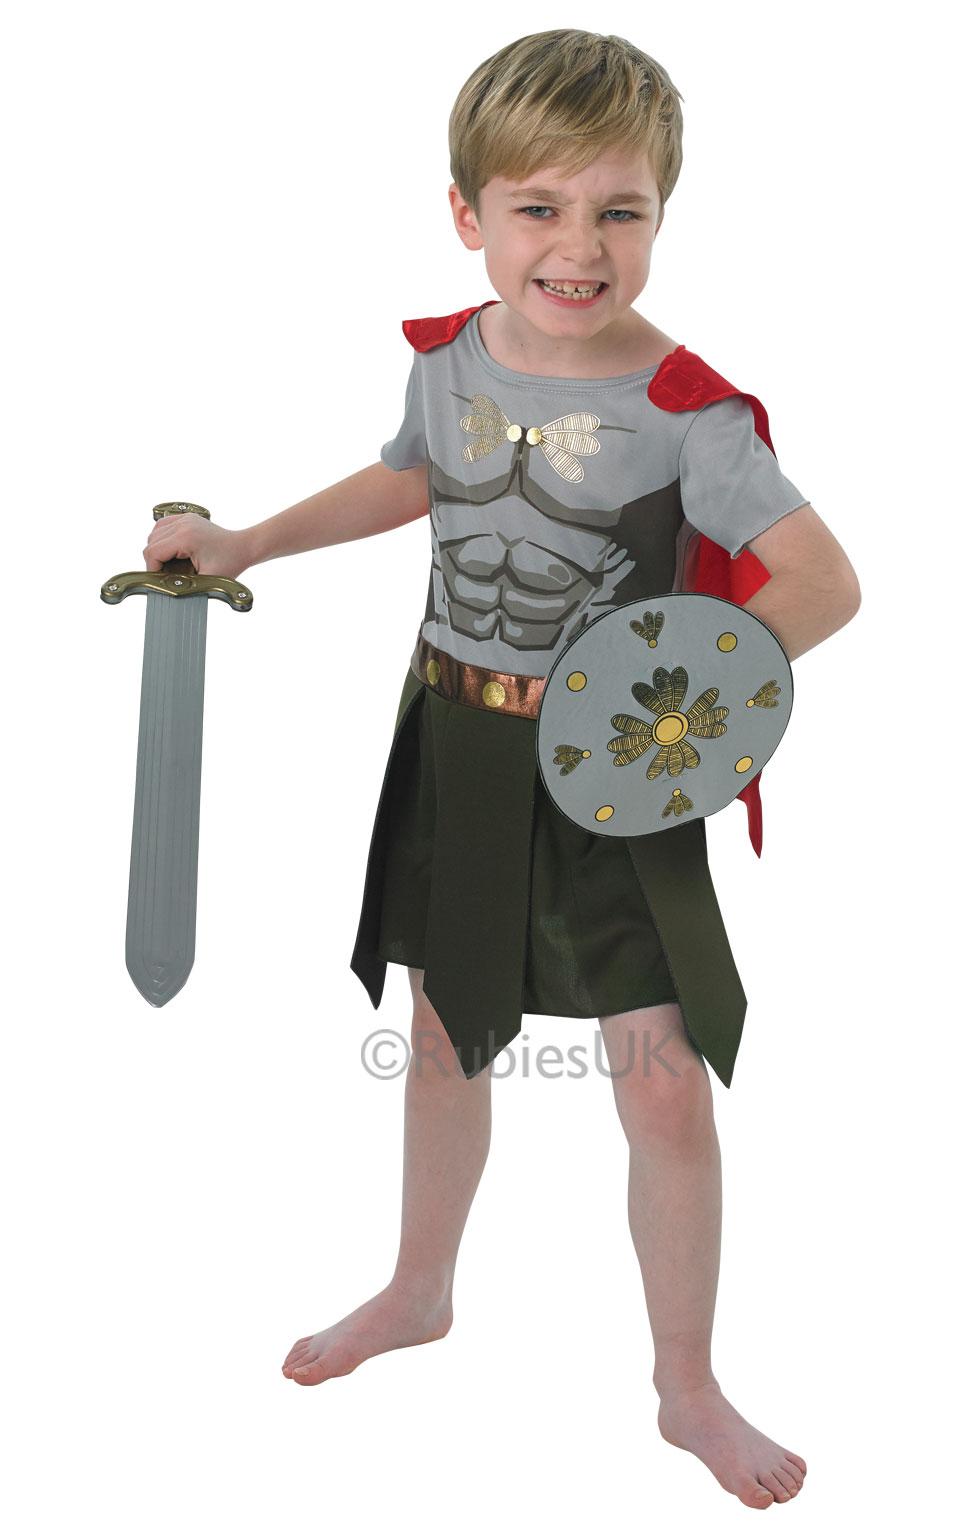 Boys Gladiator Costume  sc 1 st  Mega Fancy Dress & Boys Gladiator Costume | Boyu0027s World Book Day Fancy Dress Costumes ...